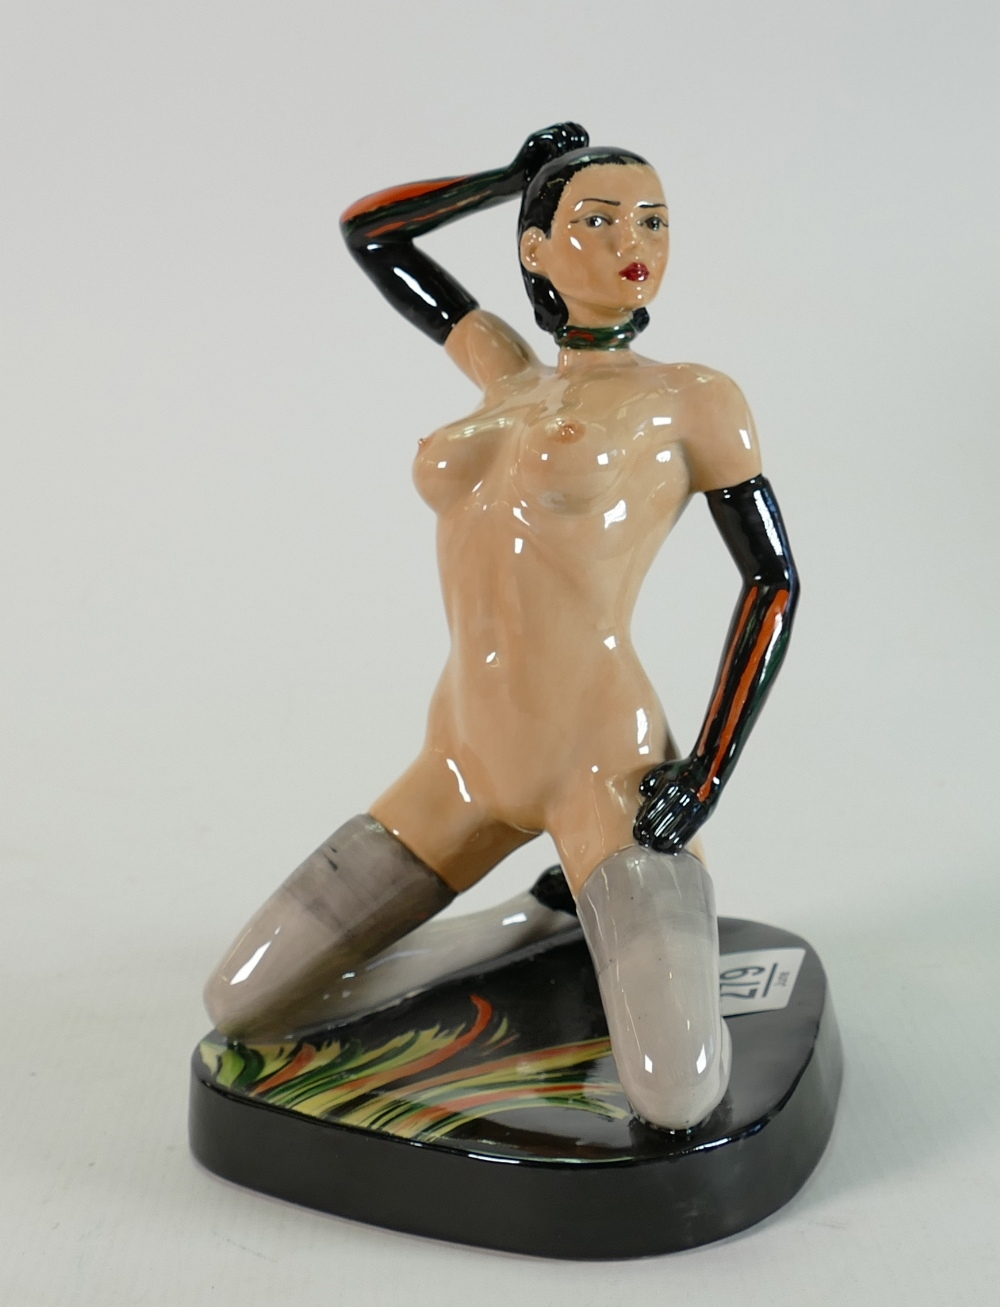 Peggy Erotic Megan Figure: Artists Original colourway, 1 of 1 by M Jackson